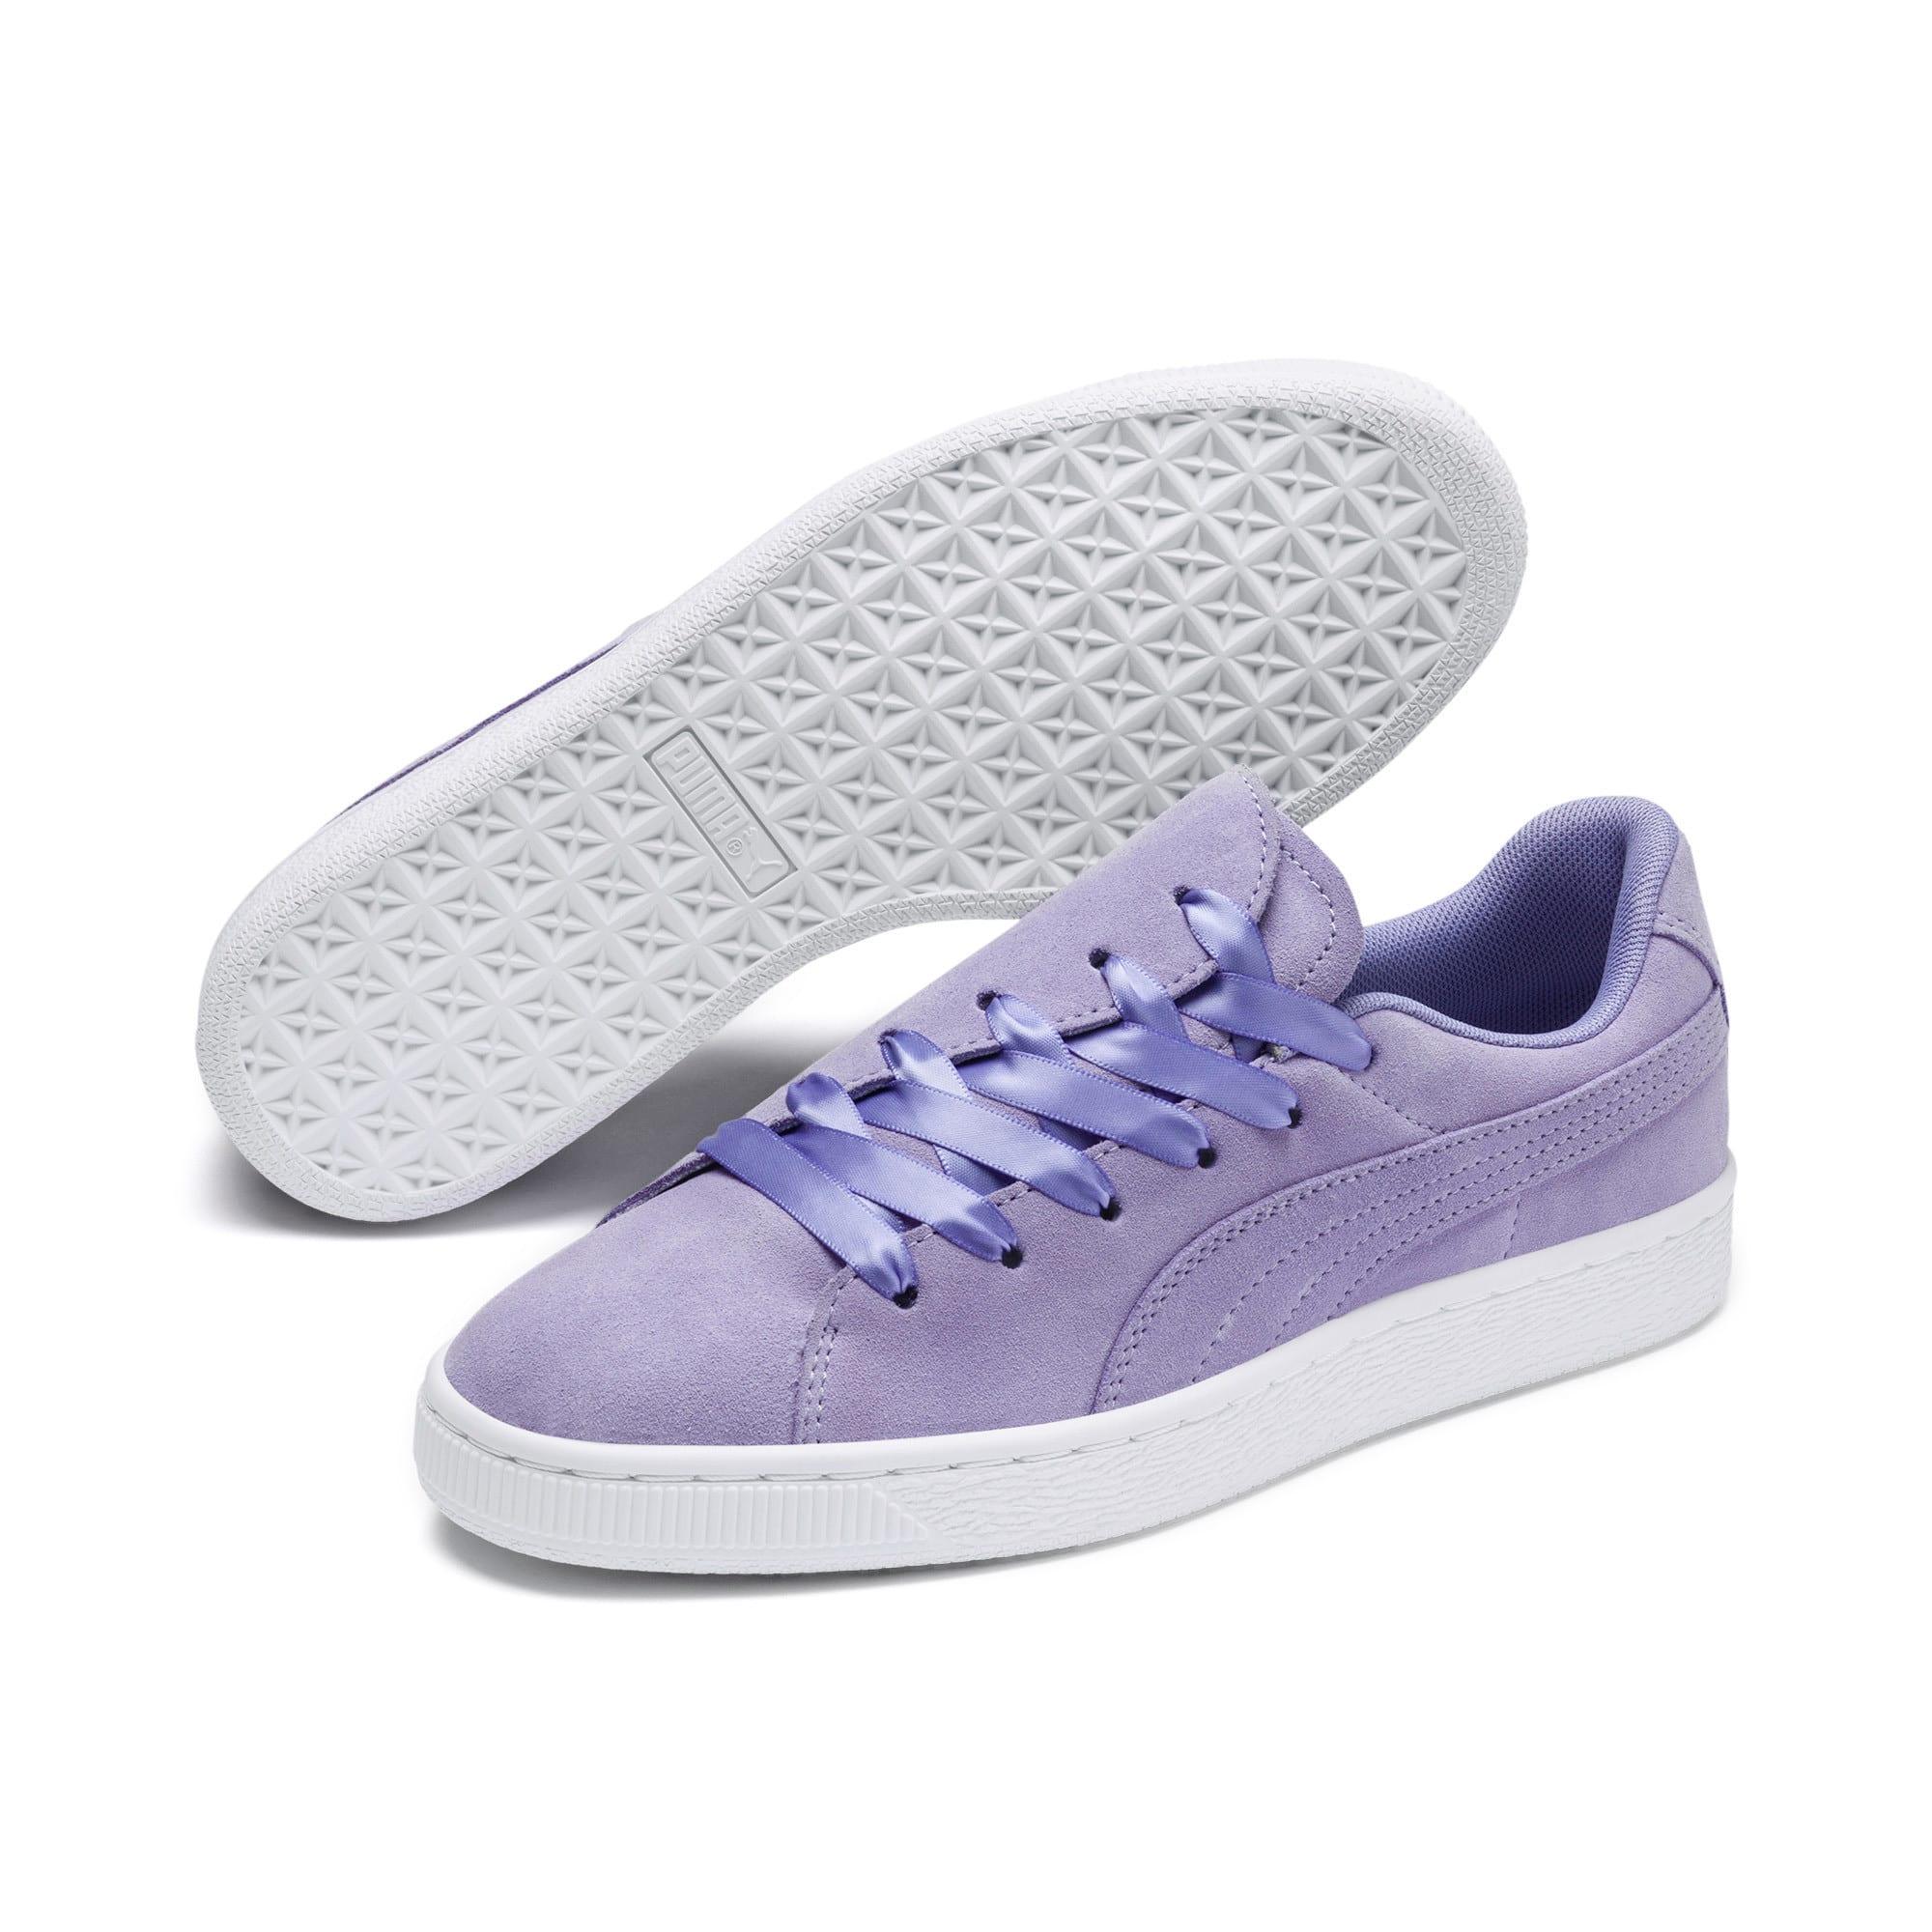 Thumbnail 6 of Suede Crush Women's Sneakers, Sweet Lavender, medium